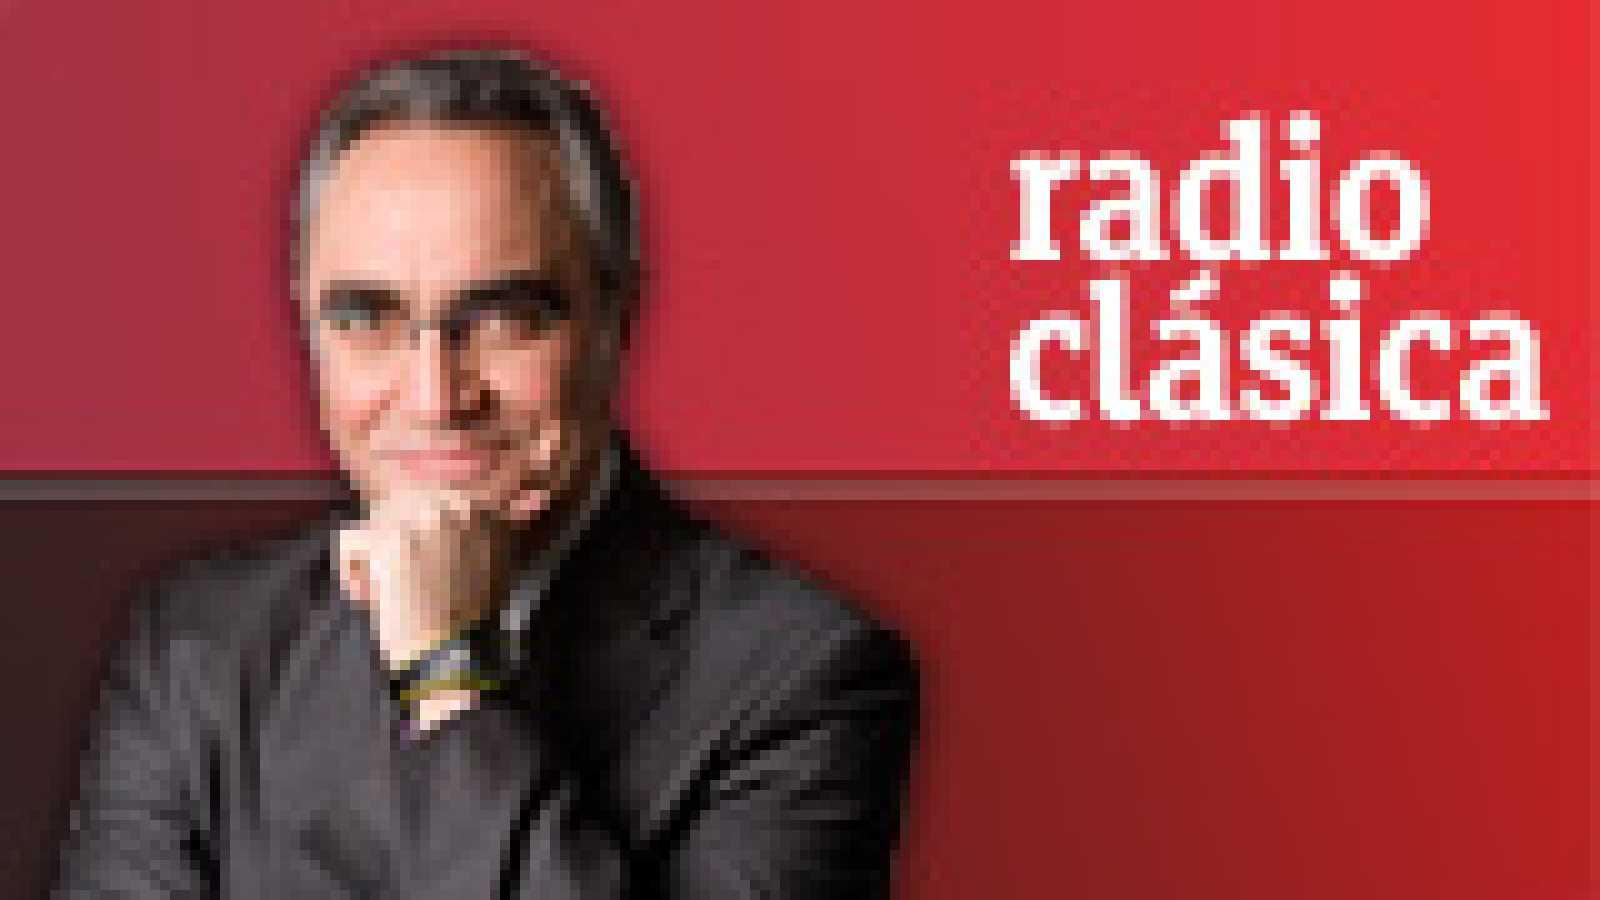 Álbum de discos - Rafael Bonavita interpreta a Bach - 15/04/12  - escuchar ahora